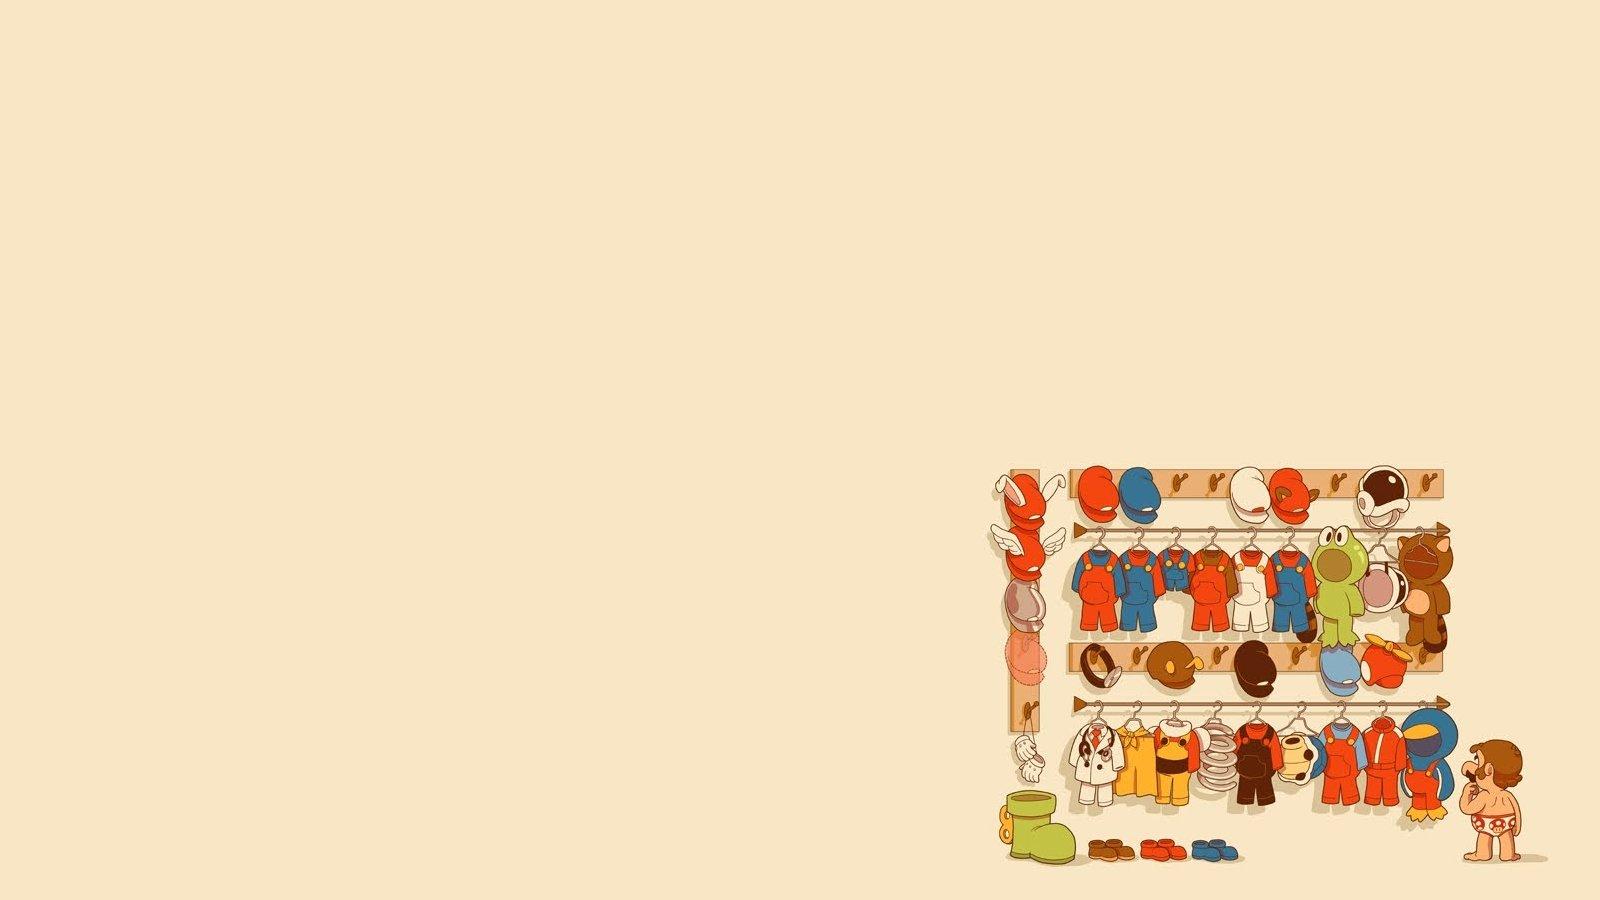 wallpaper tumblr   Wallpapers 1600x900